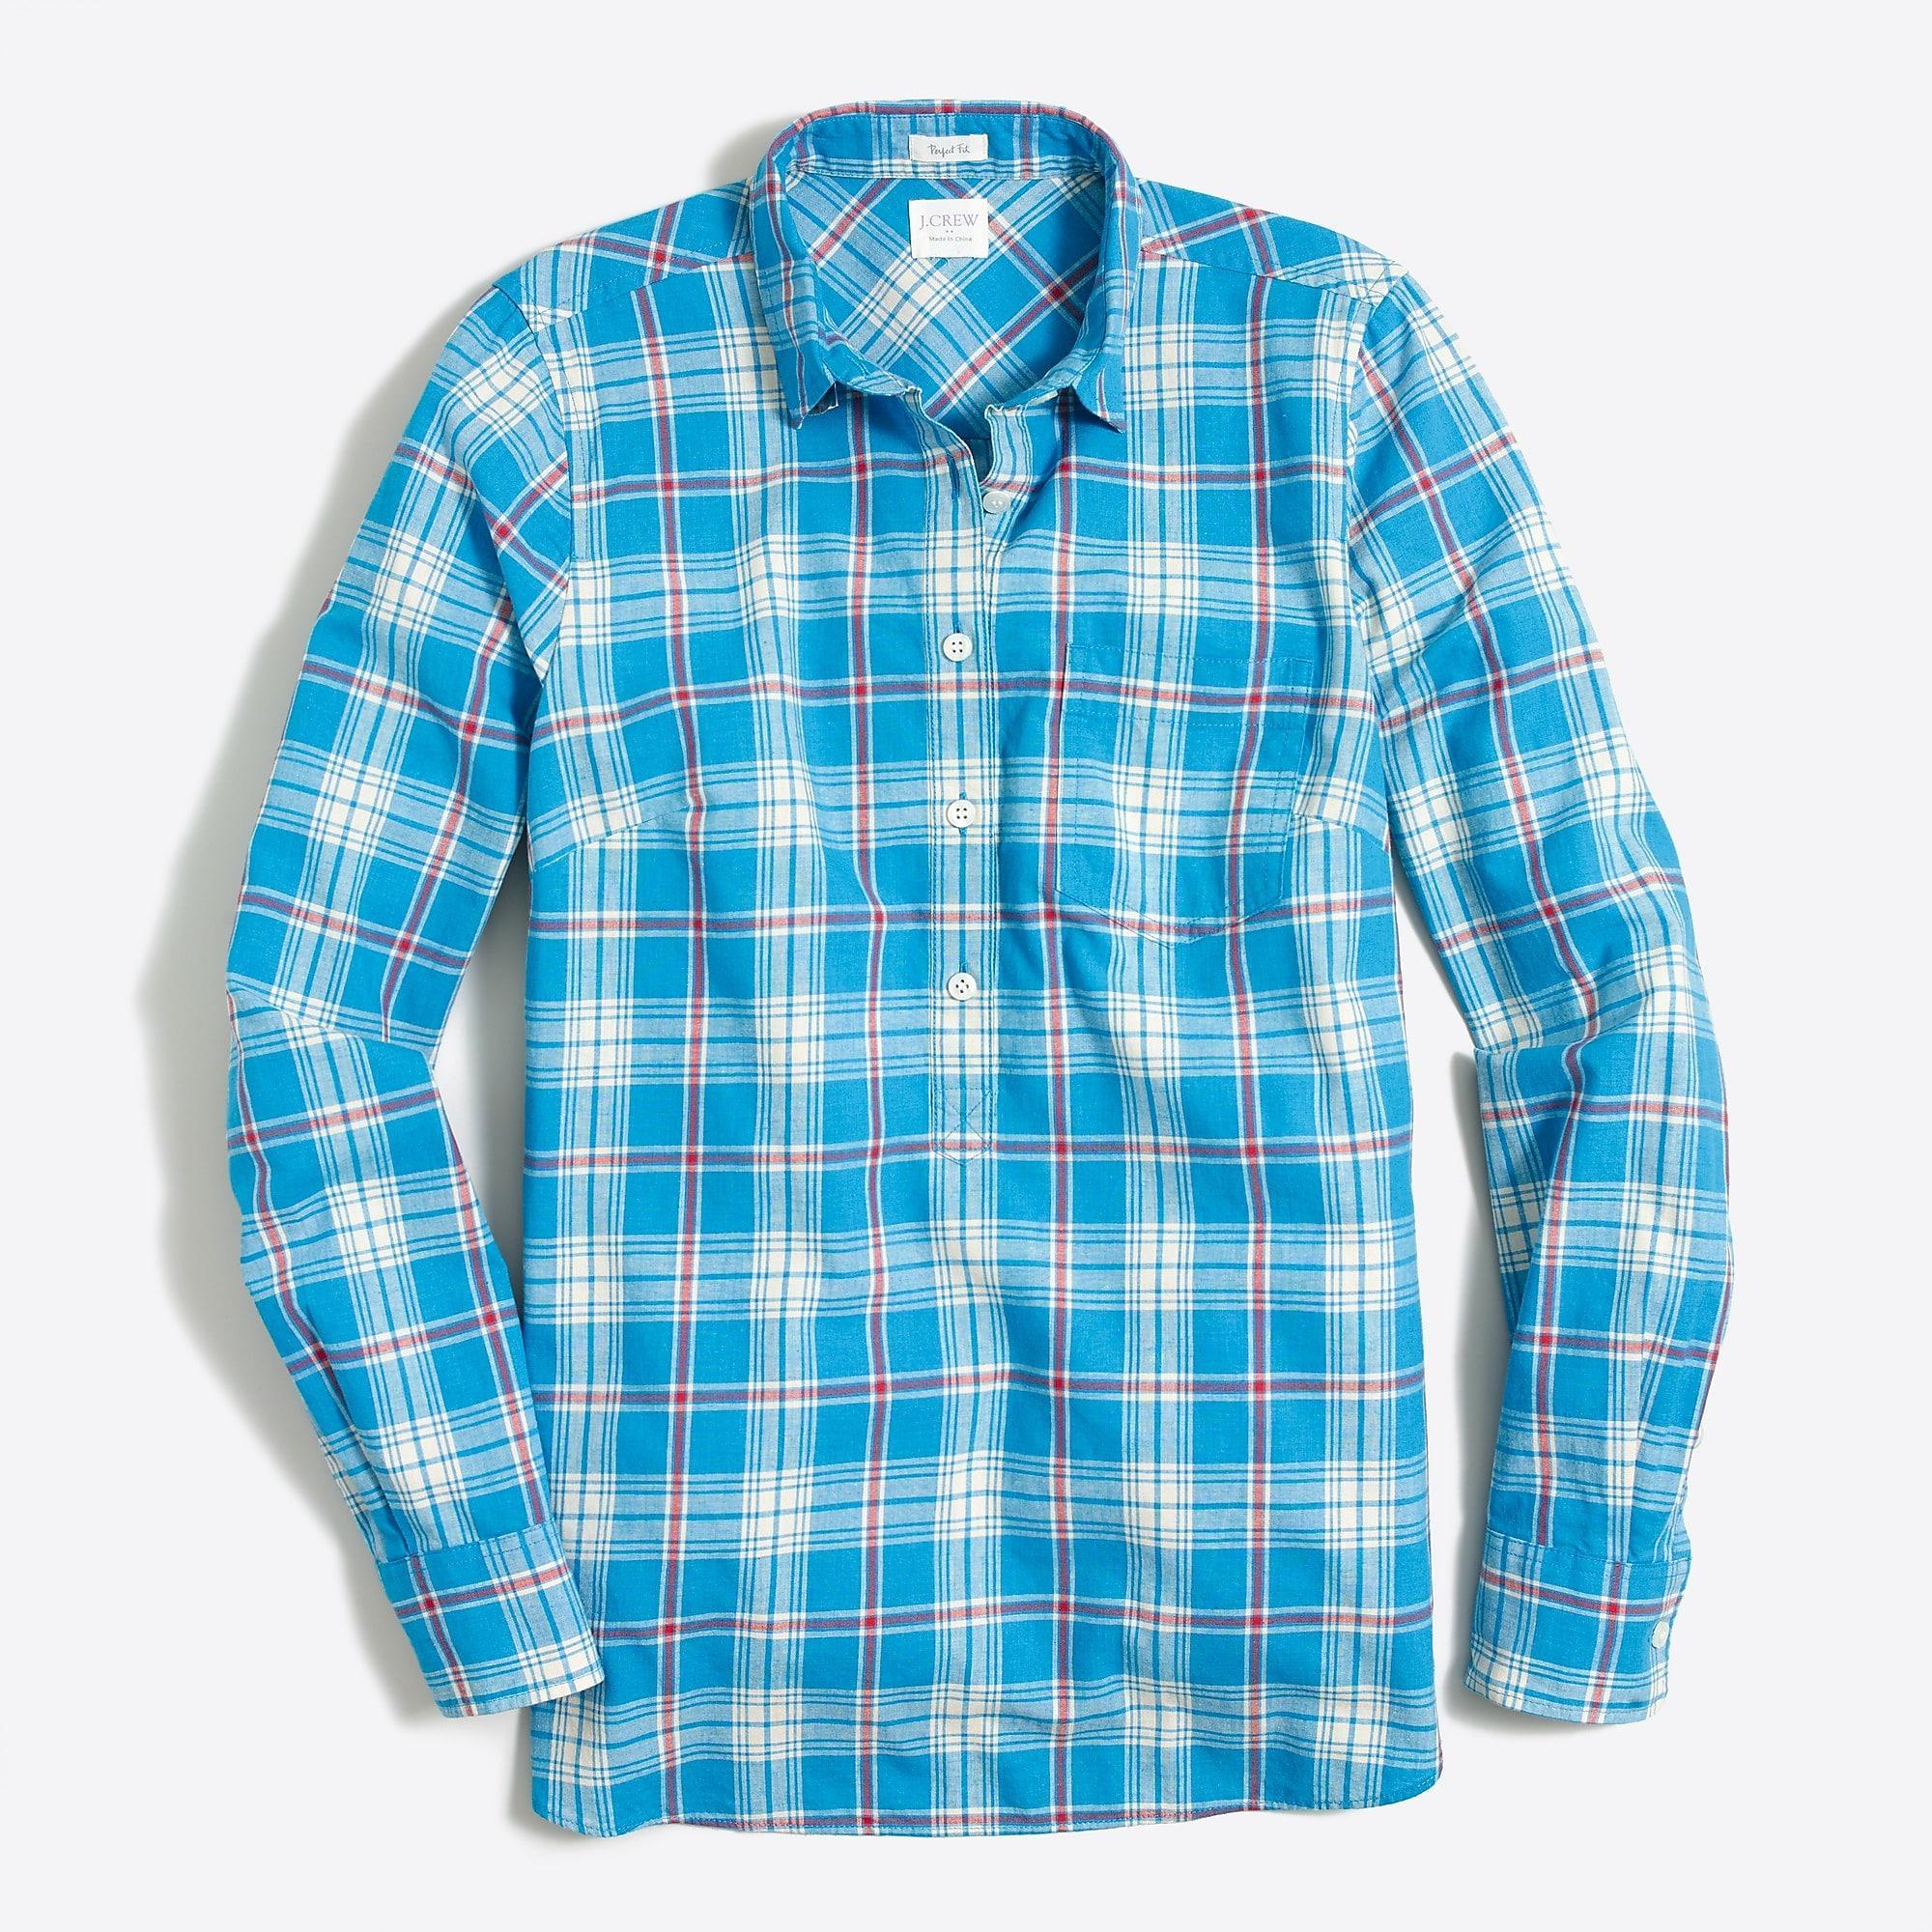 4722718b1be84 Lyst - J.Crew Petite Gingham Homespun Shirt In Perfect Fit in Blue ...